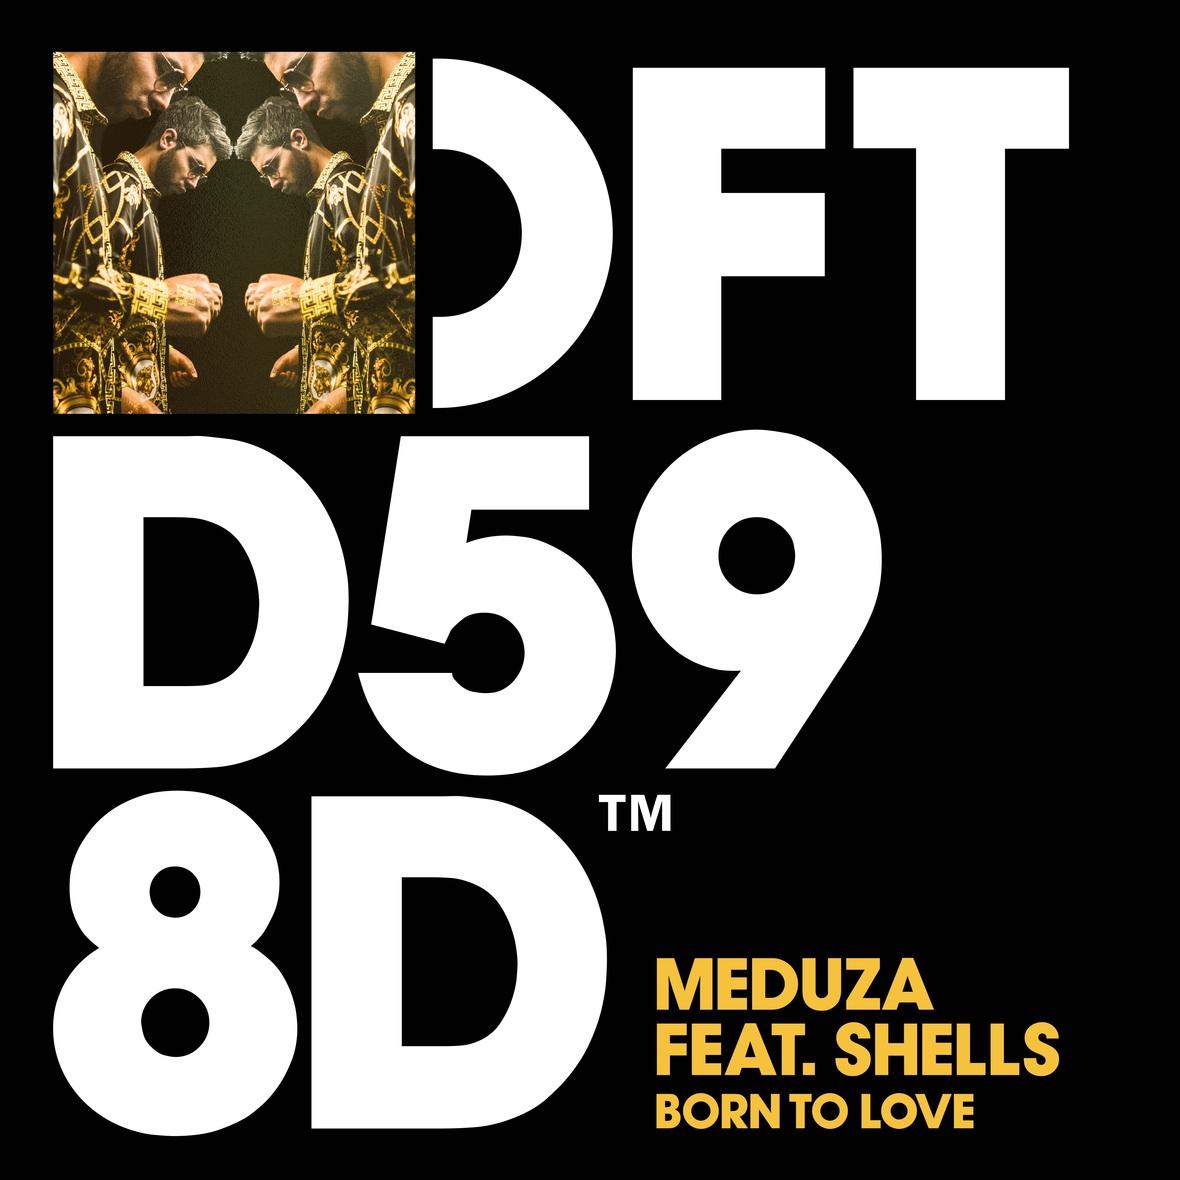 Meduza - Born To Love